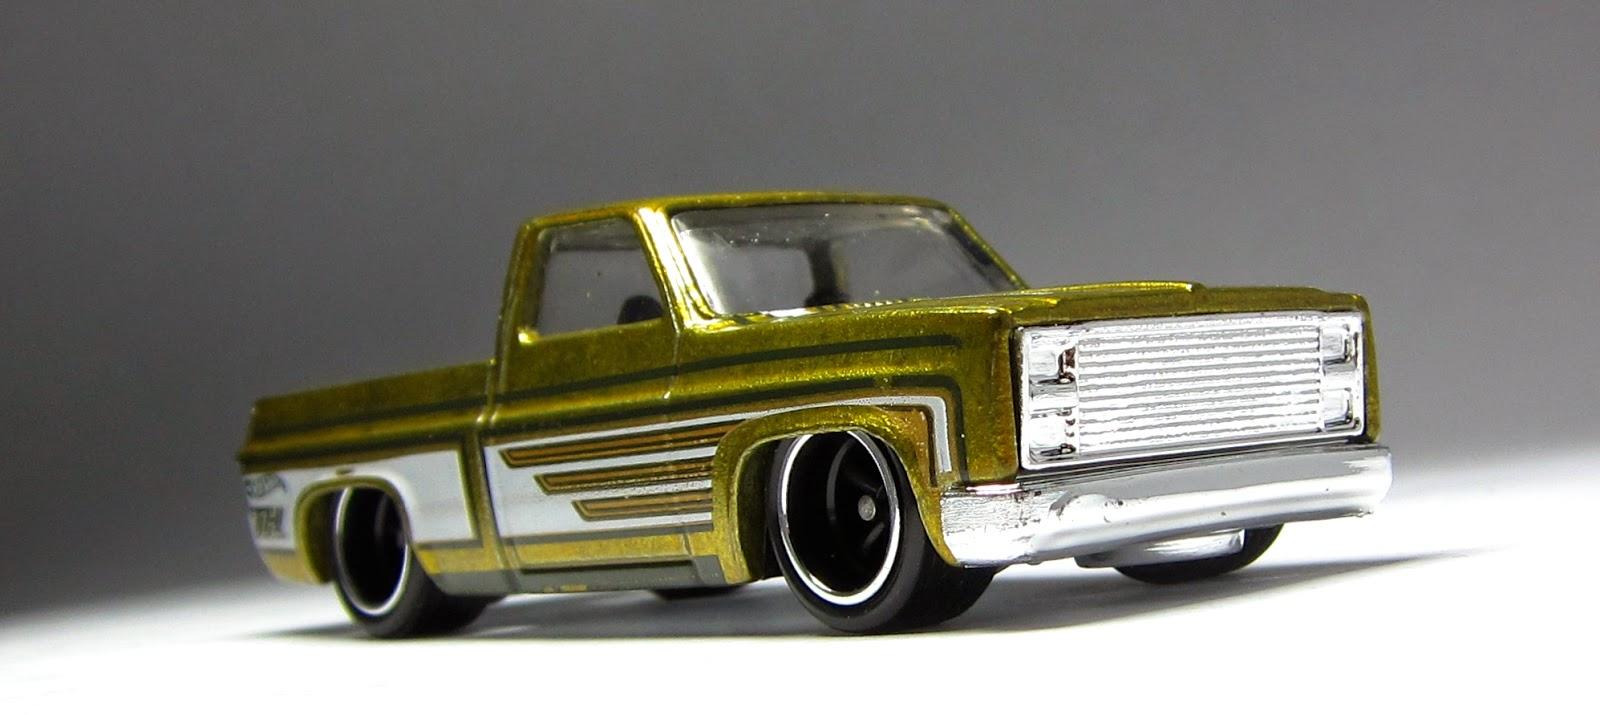 c924e78d33 Hot Wheels '83 Chevy Silverado (2014 Super Treasure Hunt & Mainline):.  Coming later today, Cool ...